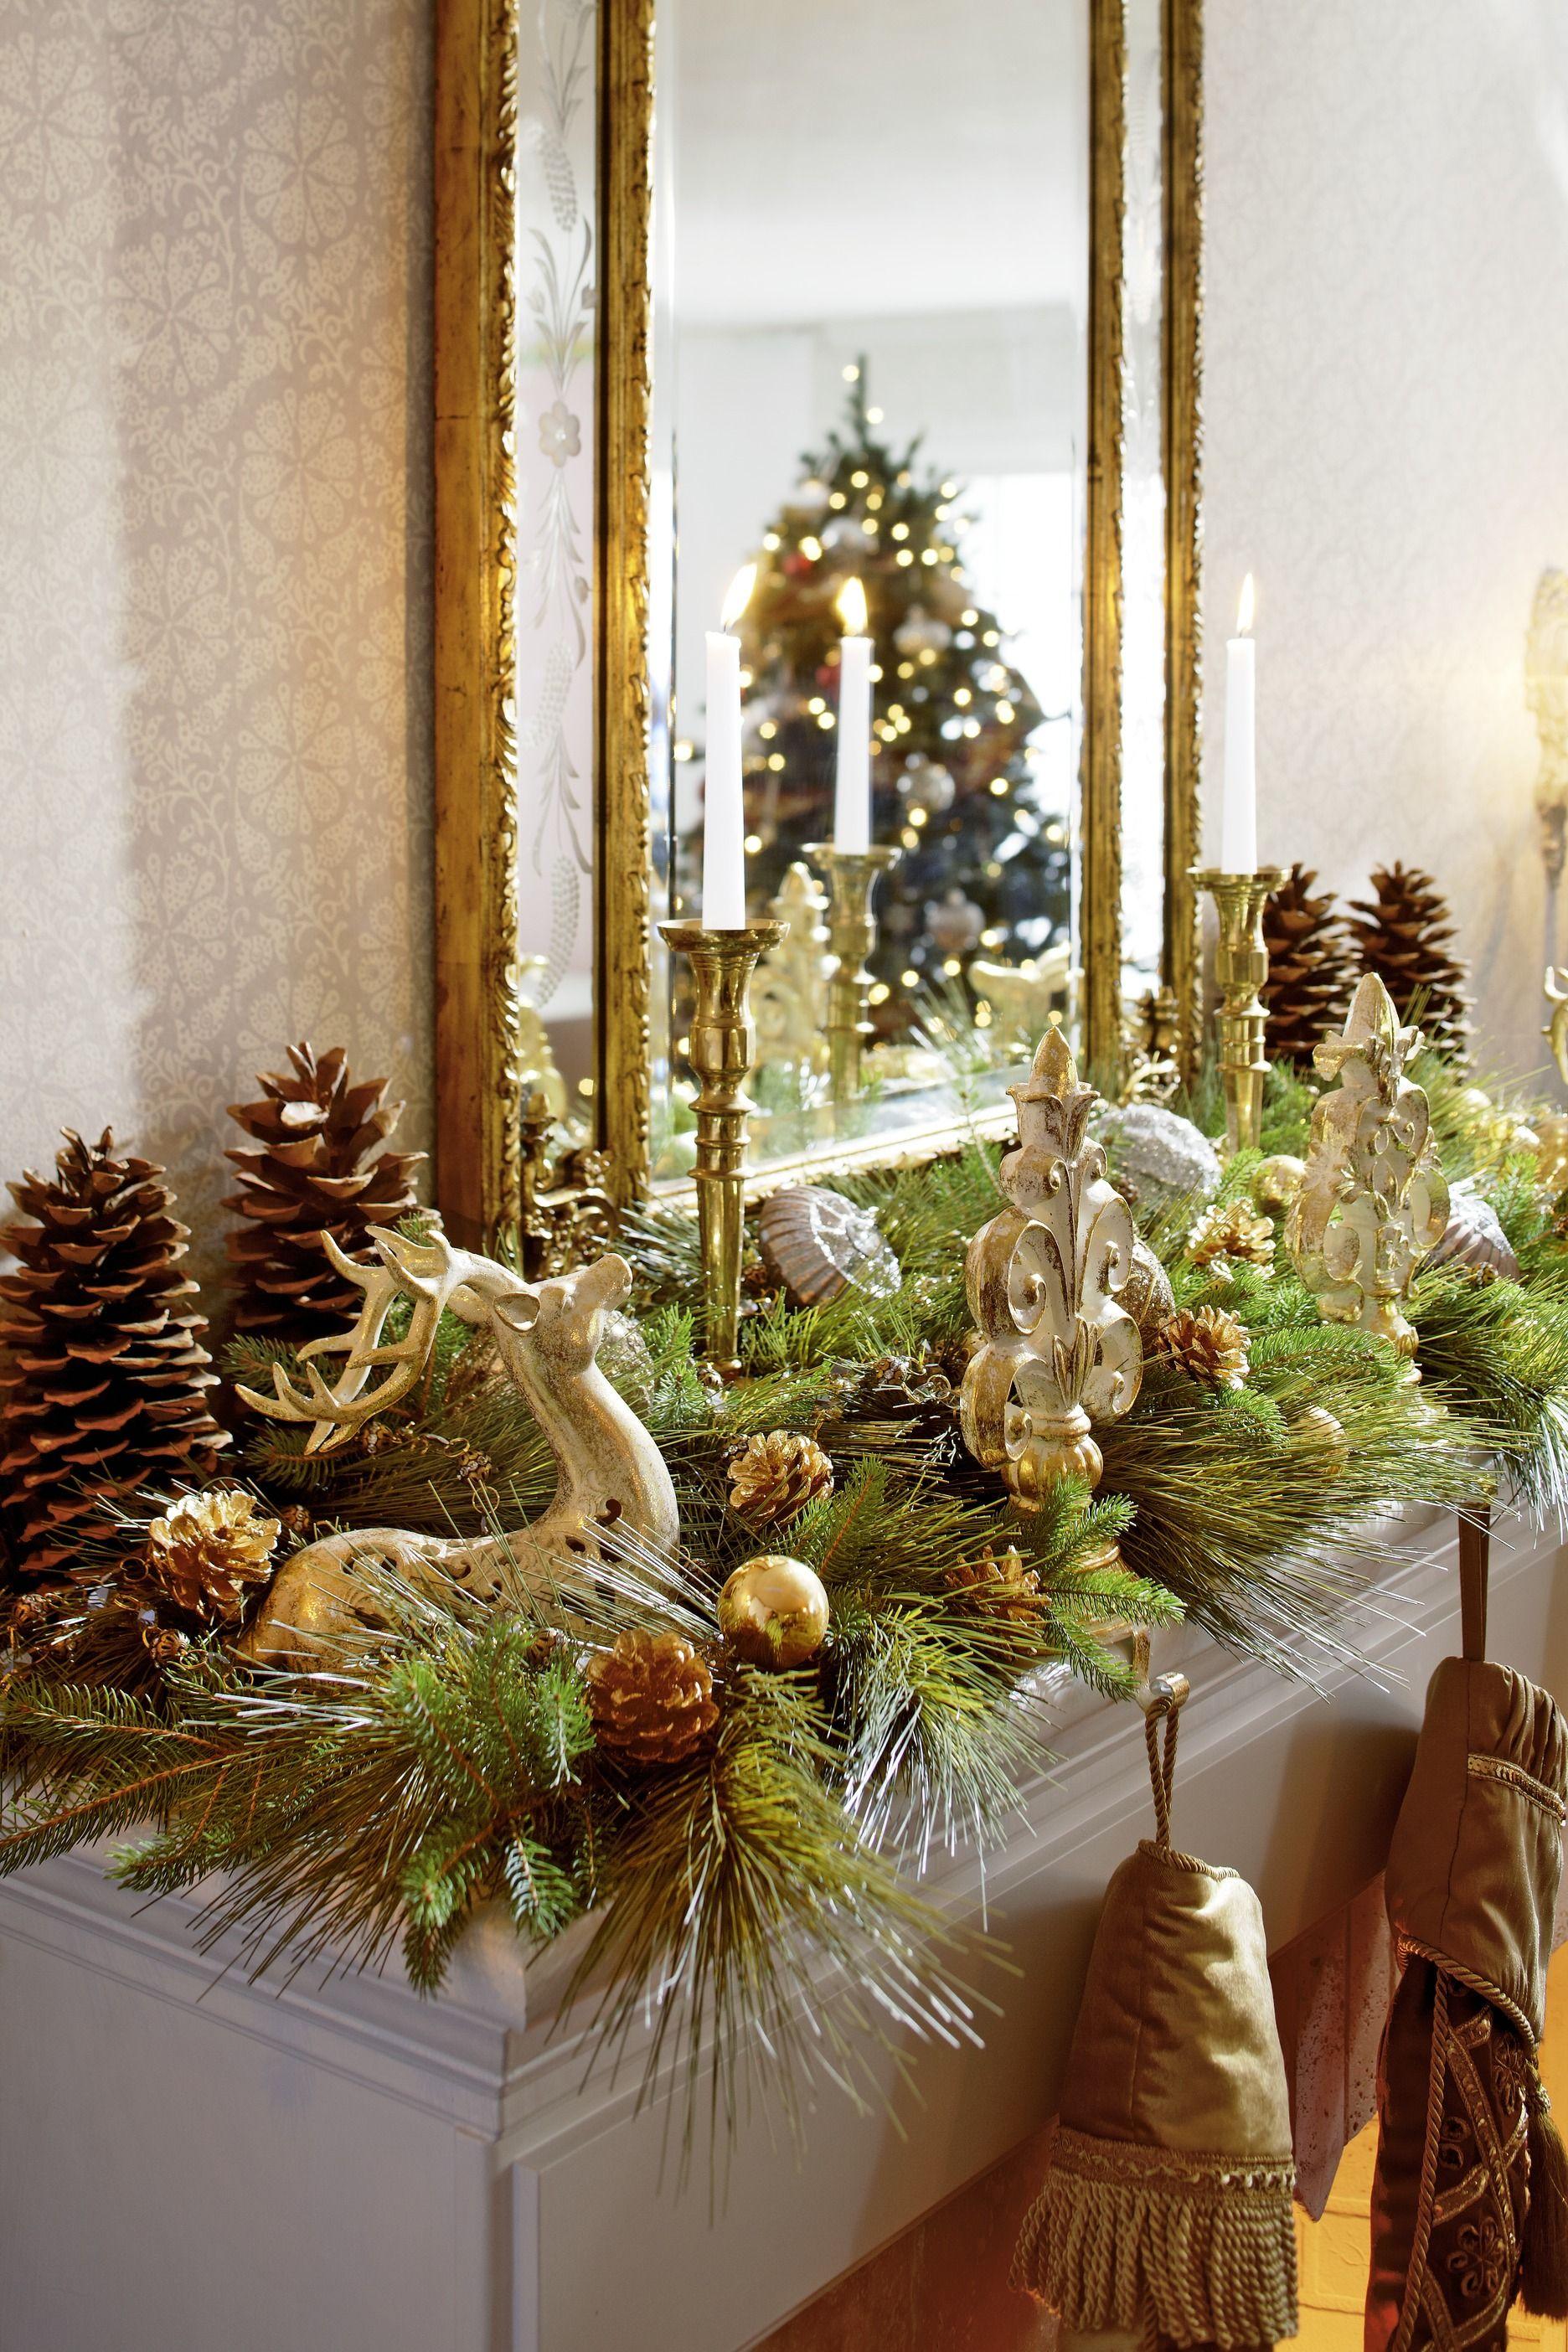 Christmas mantel decor pinterest - Decorating Holiday Mantels Traditional Home